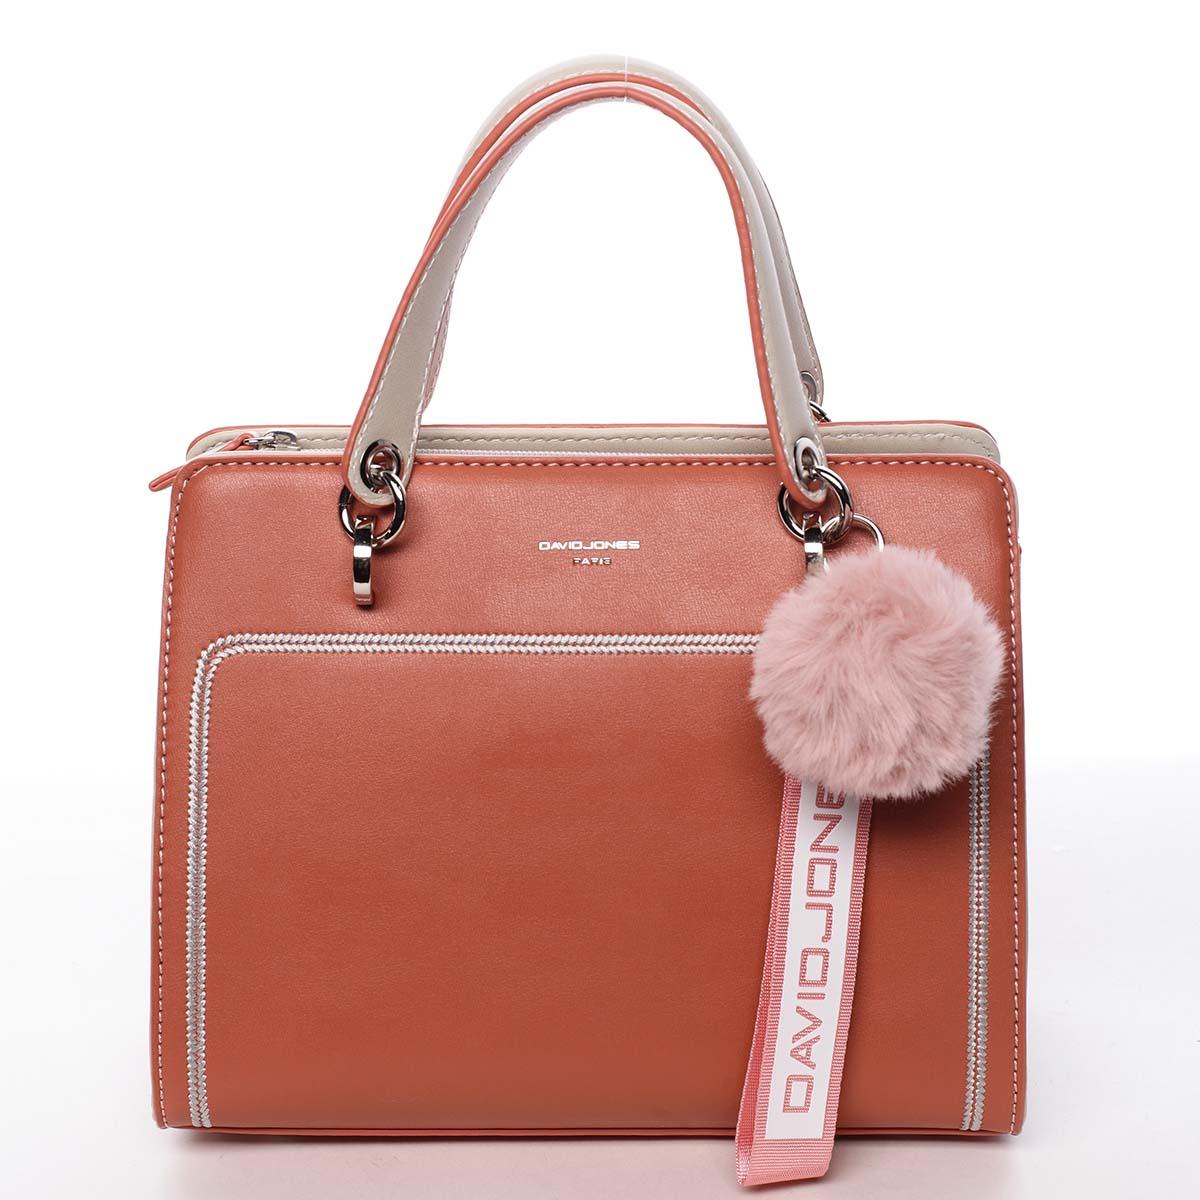 Dámská kabelka do ruky růžově oranžová - David Jones Adalgisa